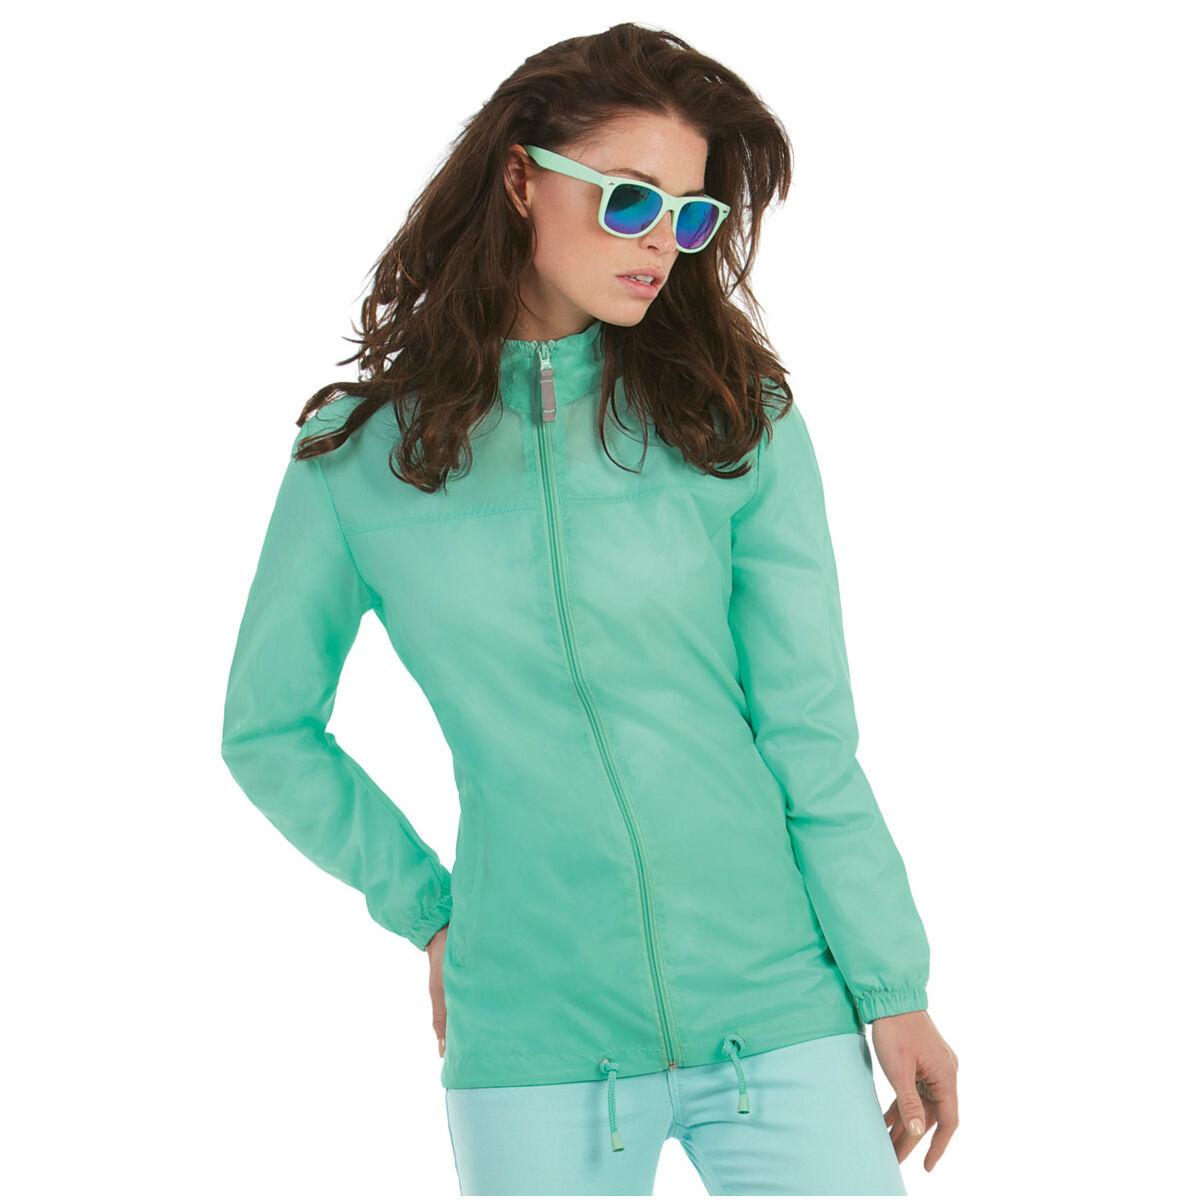 B&C Sirocco Lightweight Jacket (Turquoise)